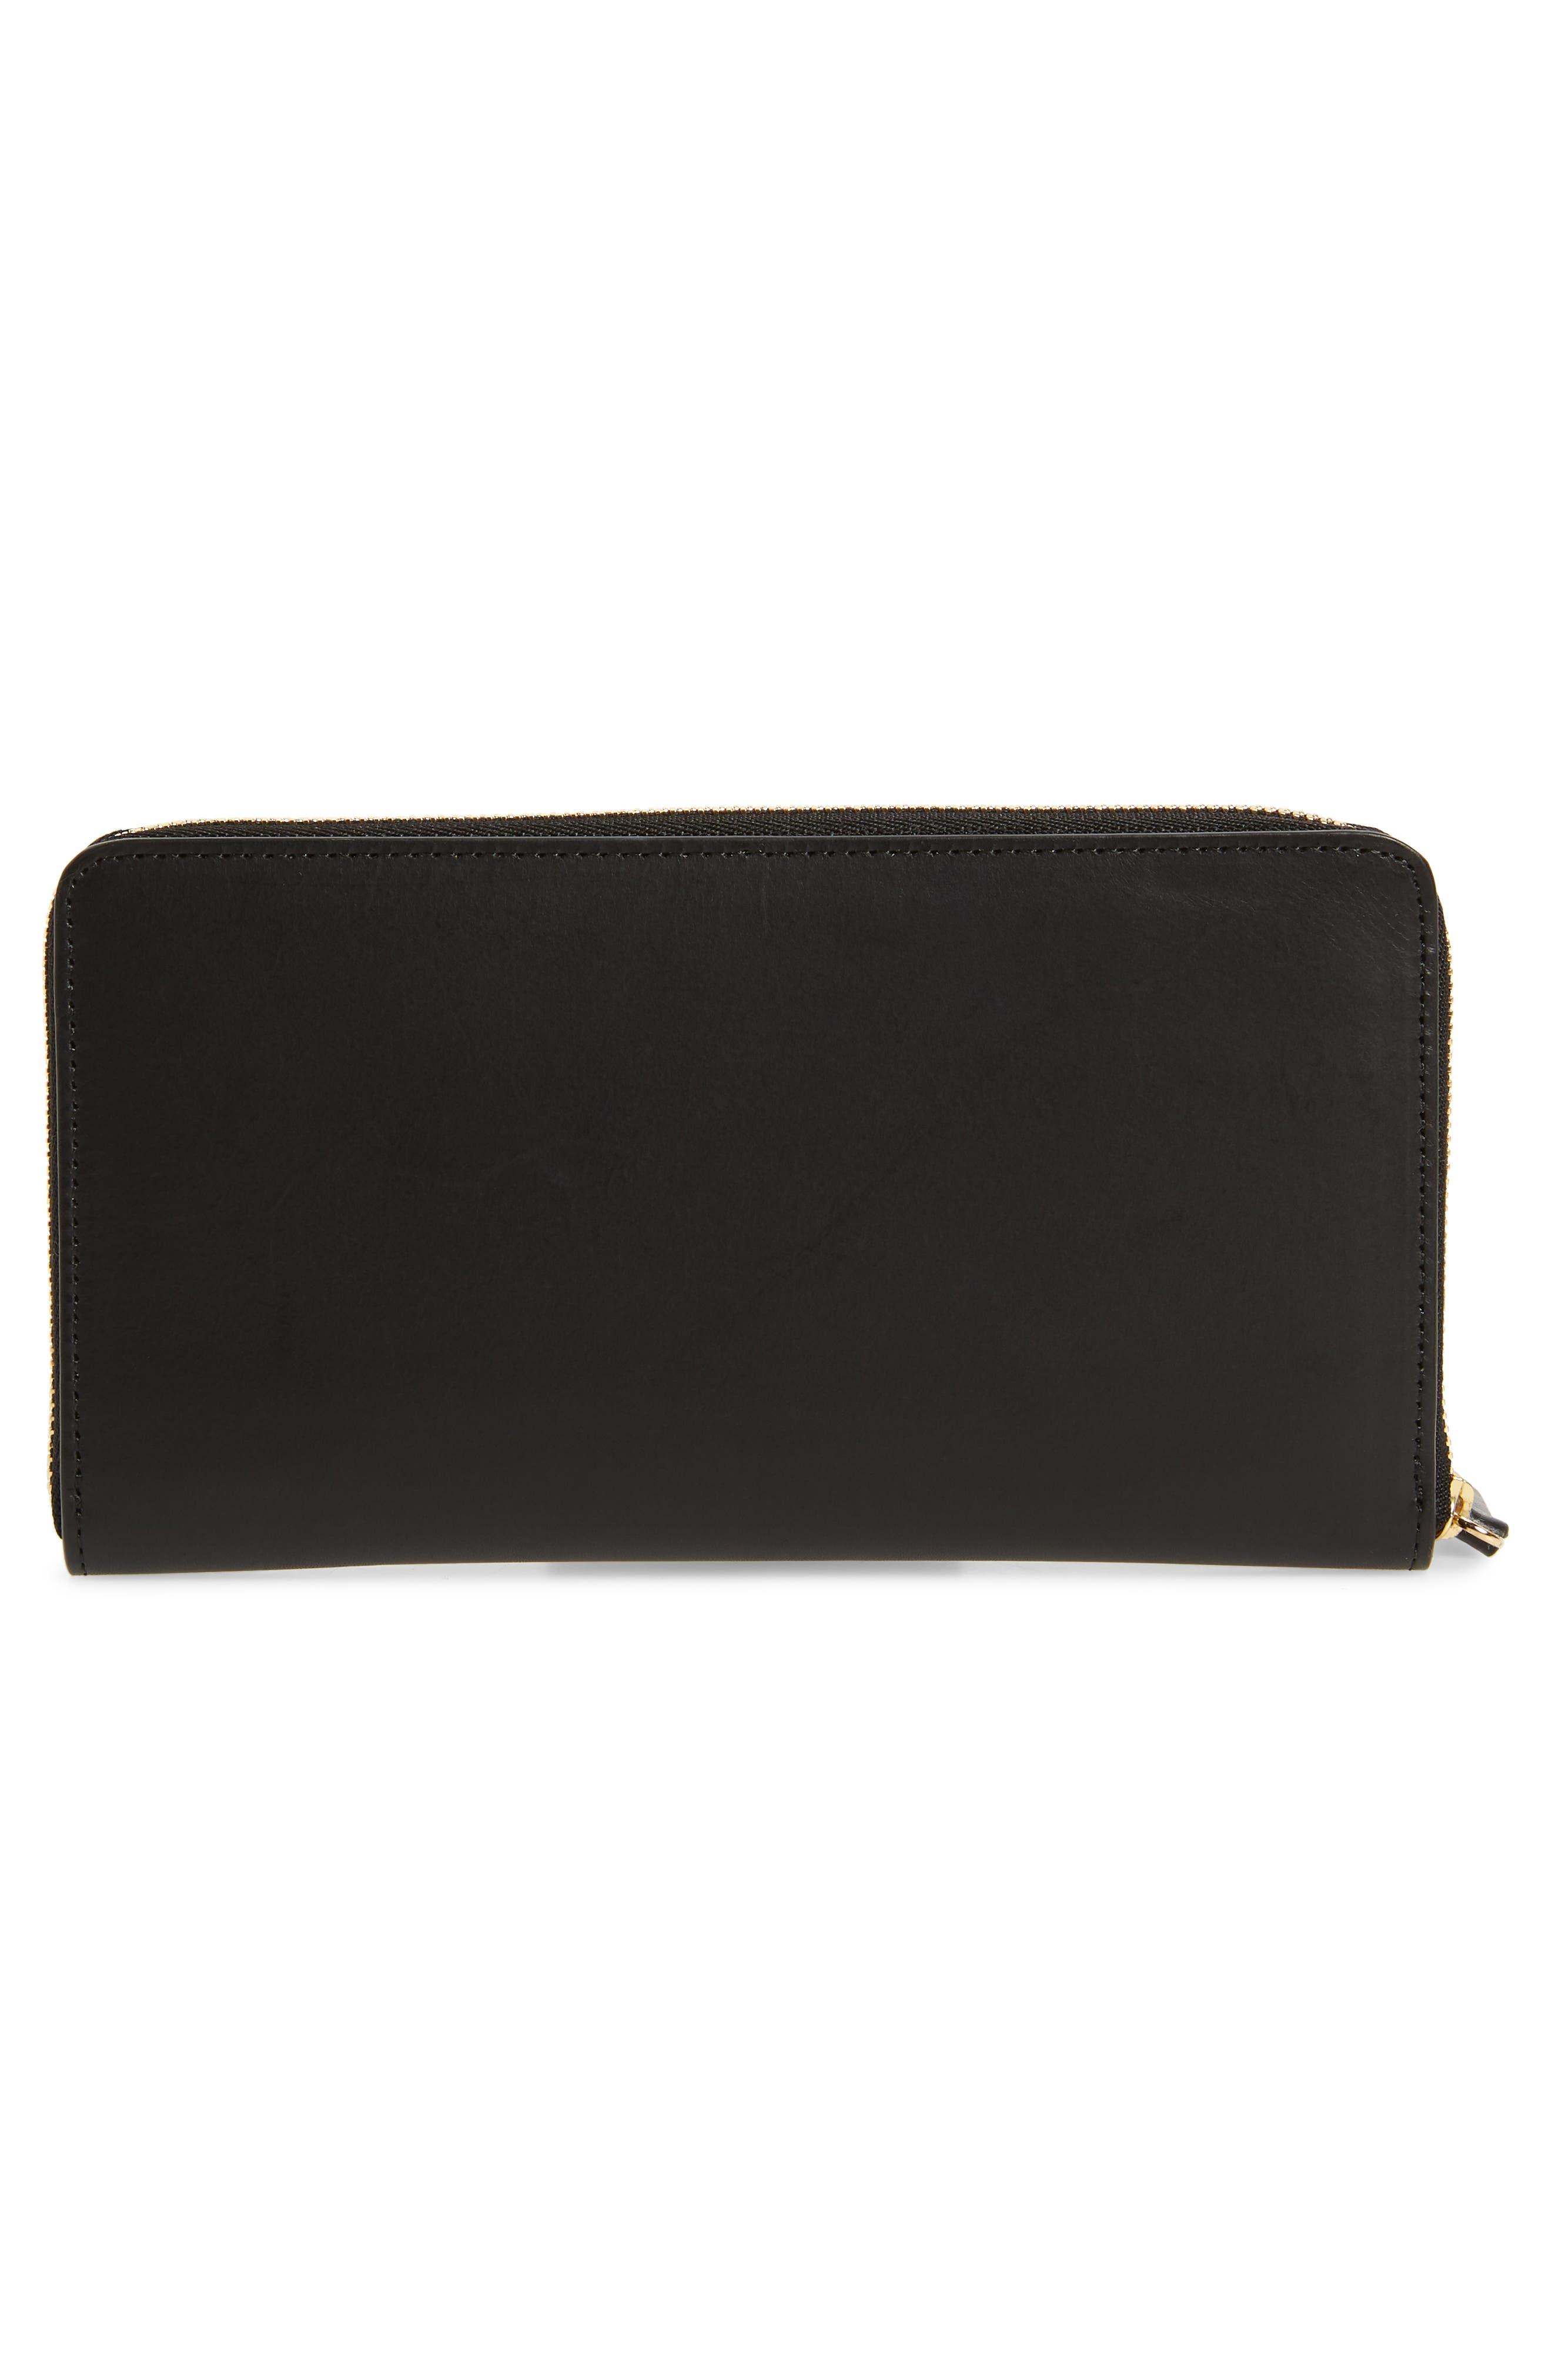 Continental Zip Leather Wallet,                             Alternate thumbnail 3, color,                             BLACK/ FLAMMA